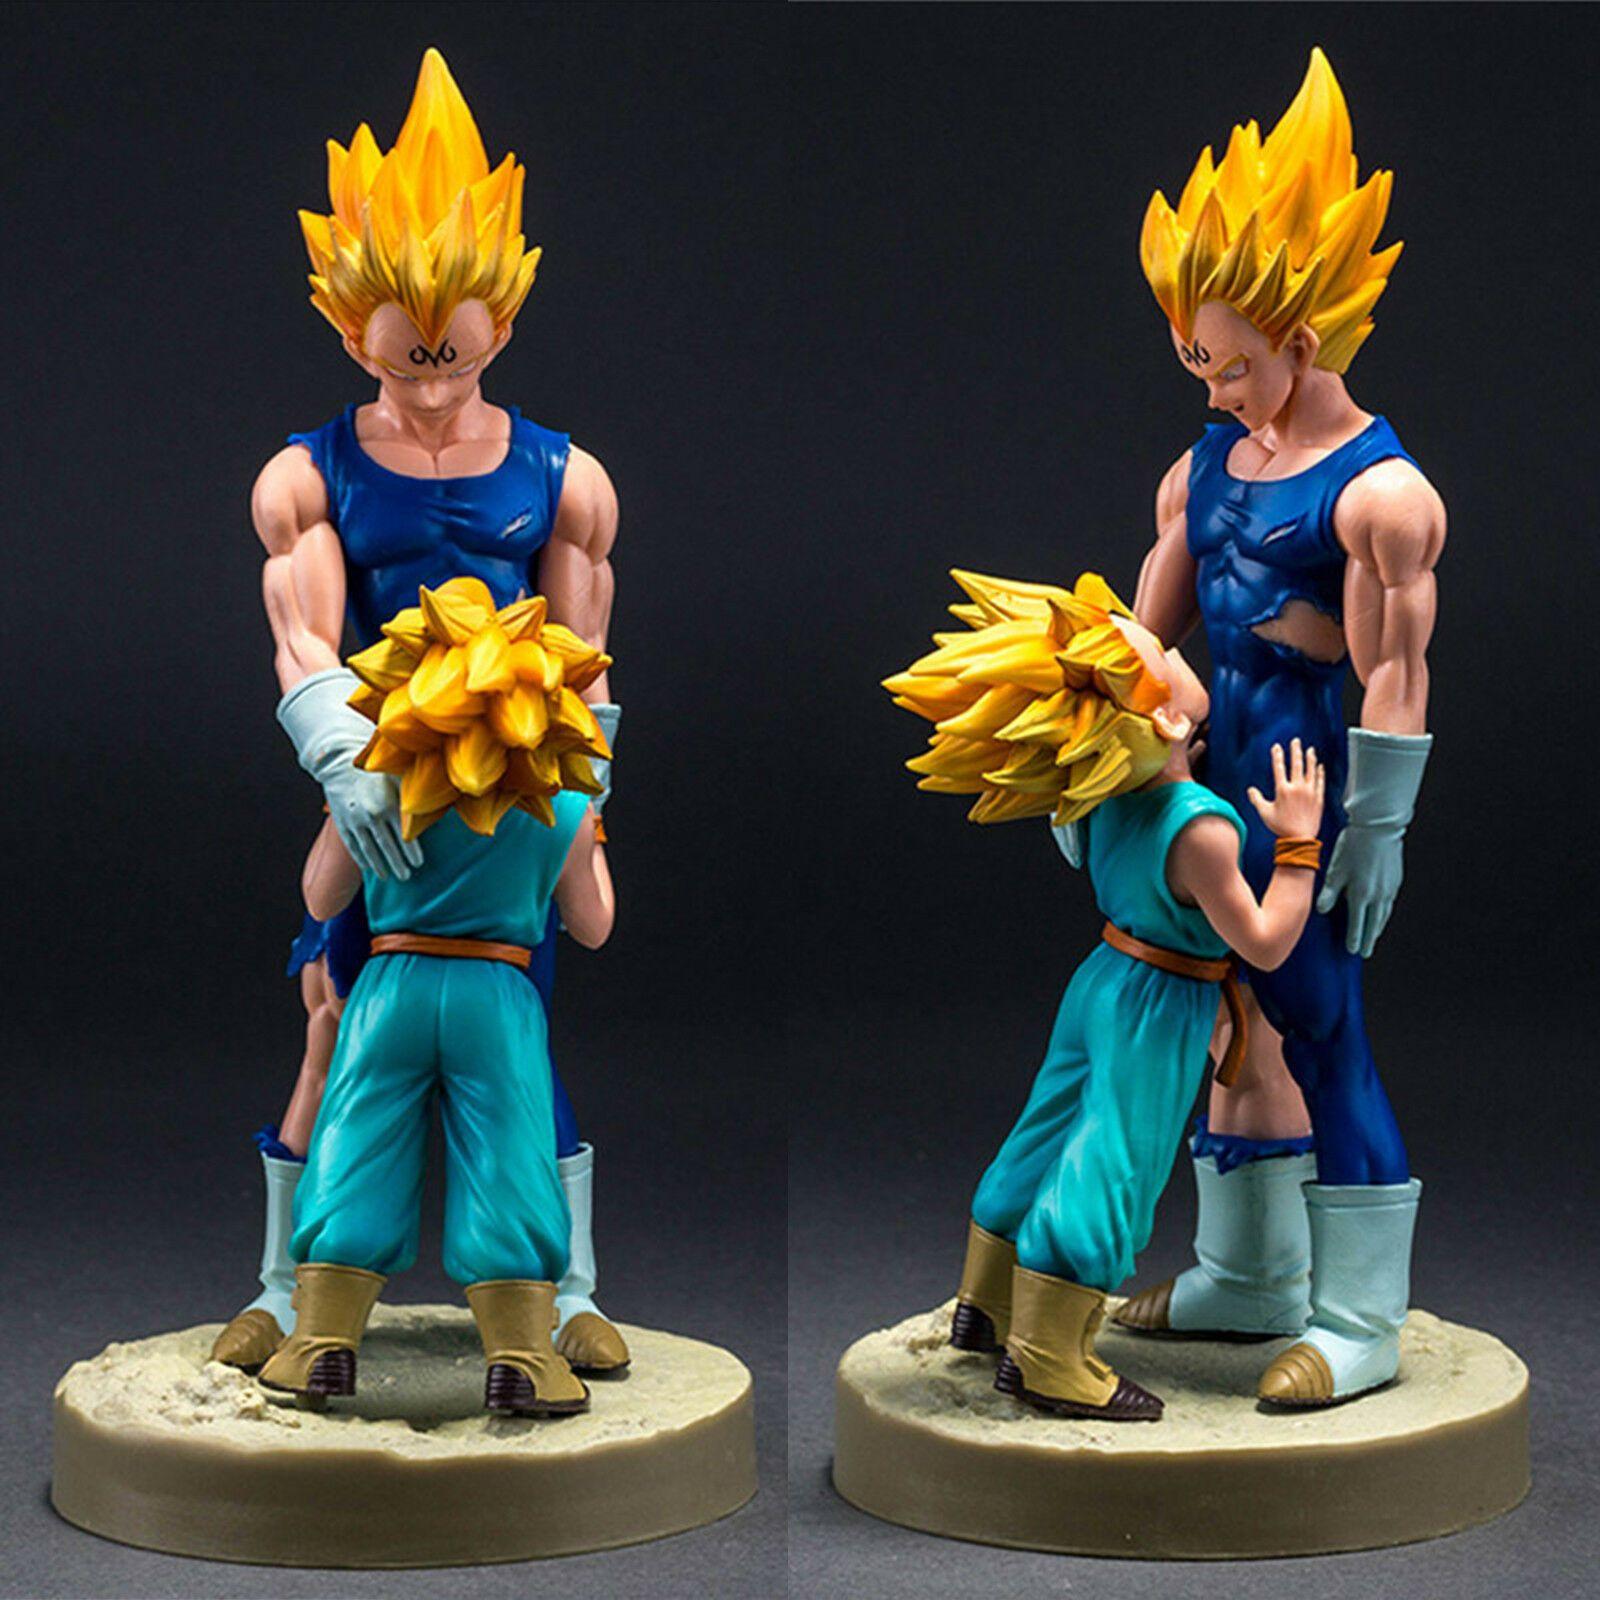 DragonBall Z DS4 Majin Vegeta Trunks DBZ PVC Anime Figure Figurine Toy In Box